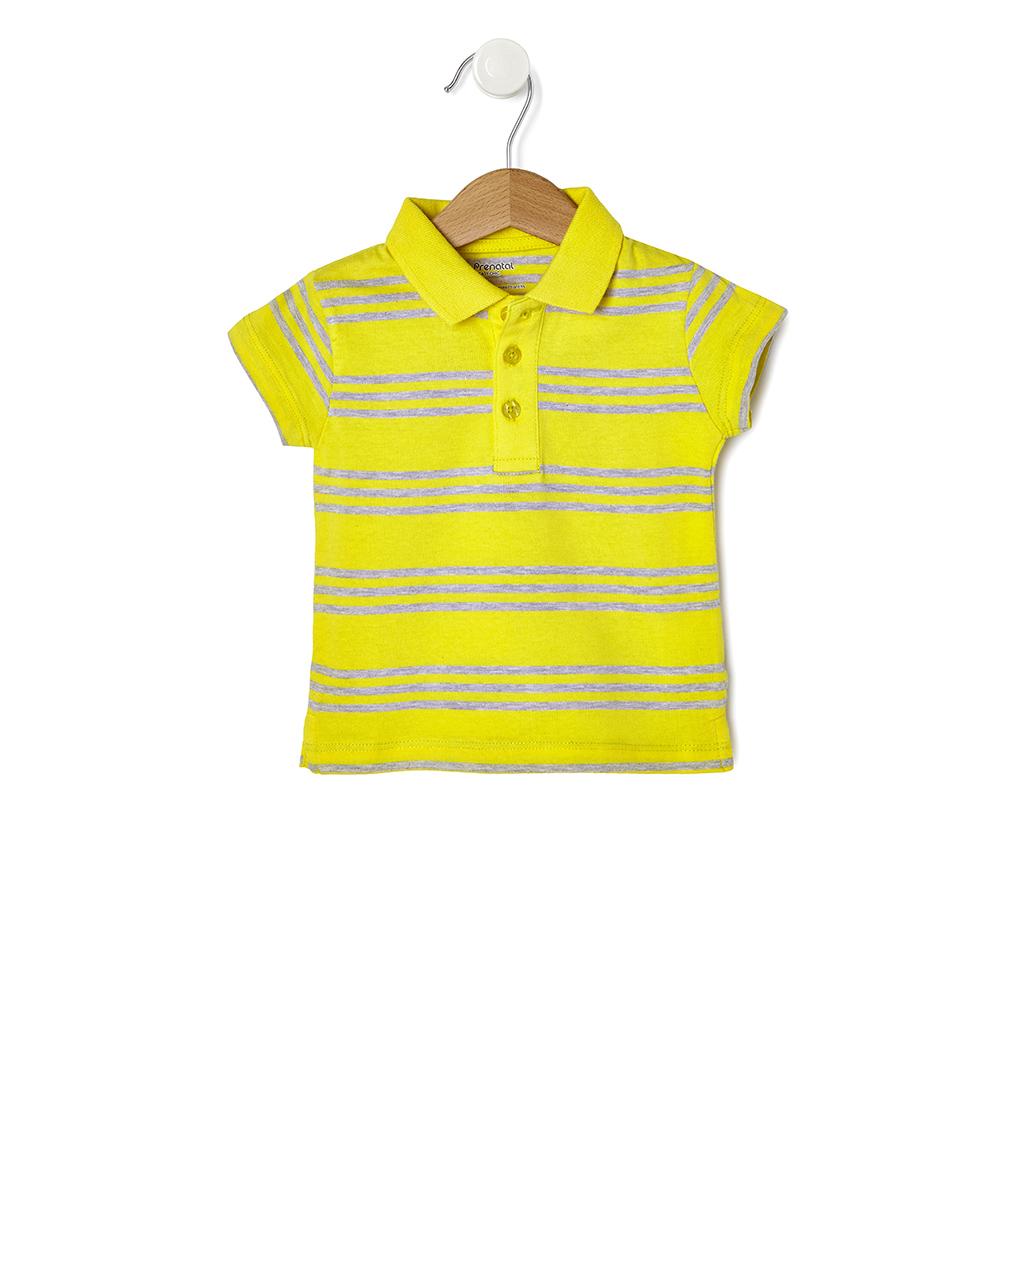 T-shirt Jersey Πόλο Ριγέ Κίτρινο - Γκρι για Αγόρι